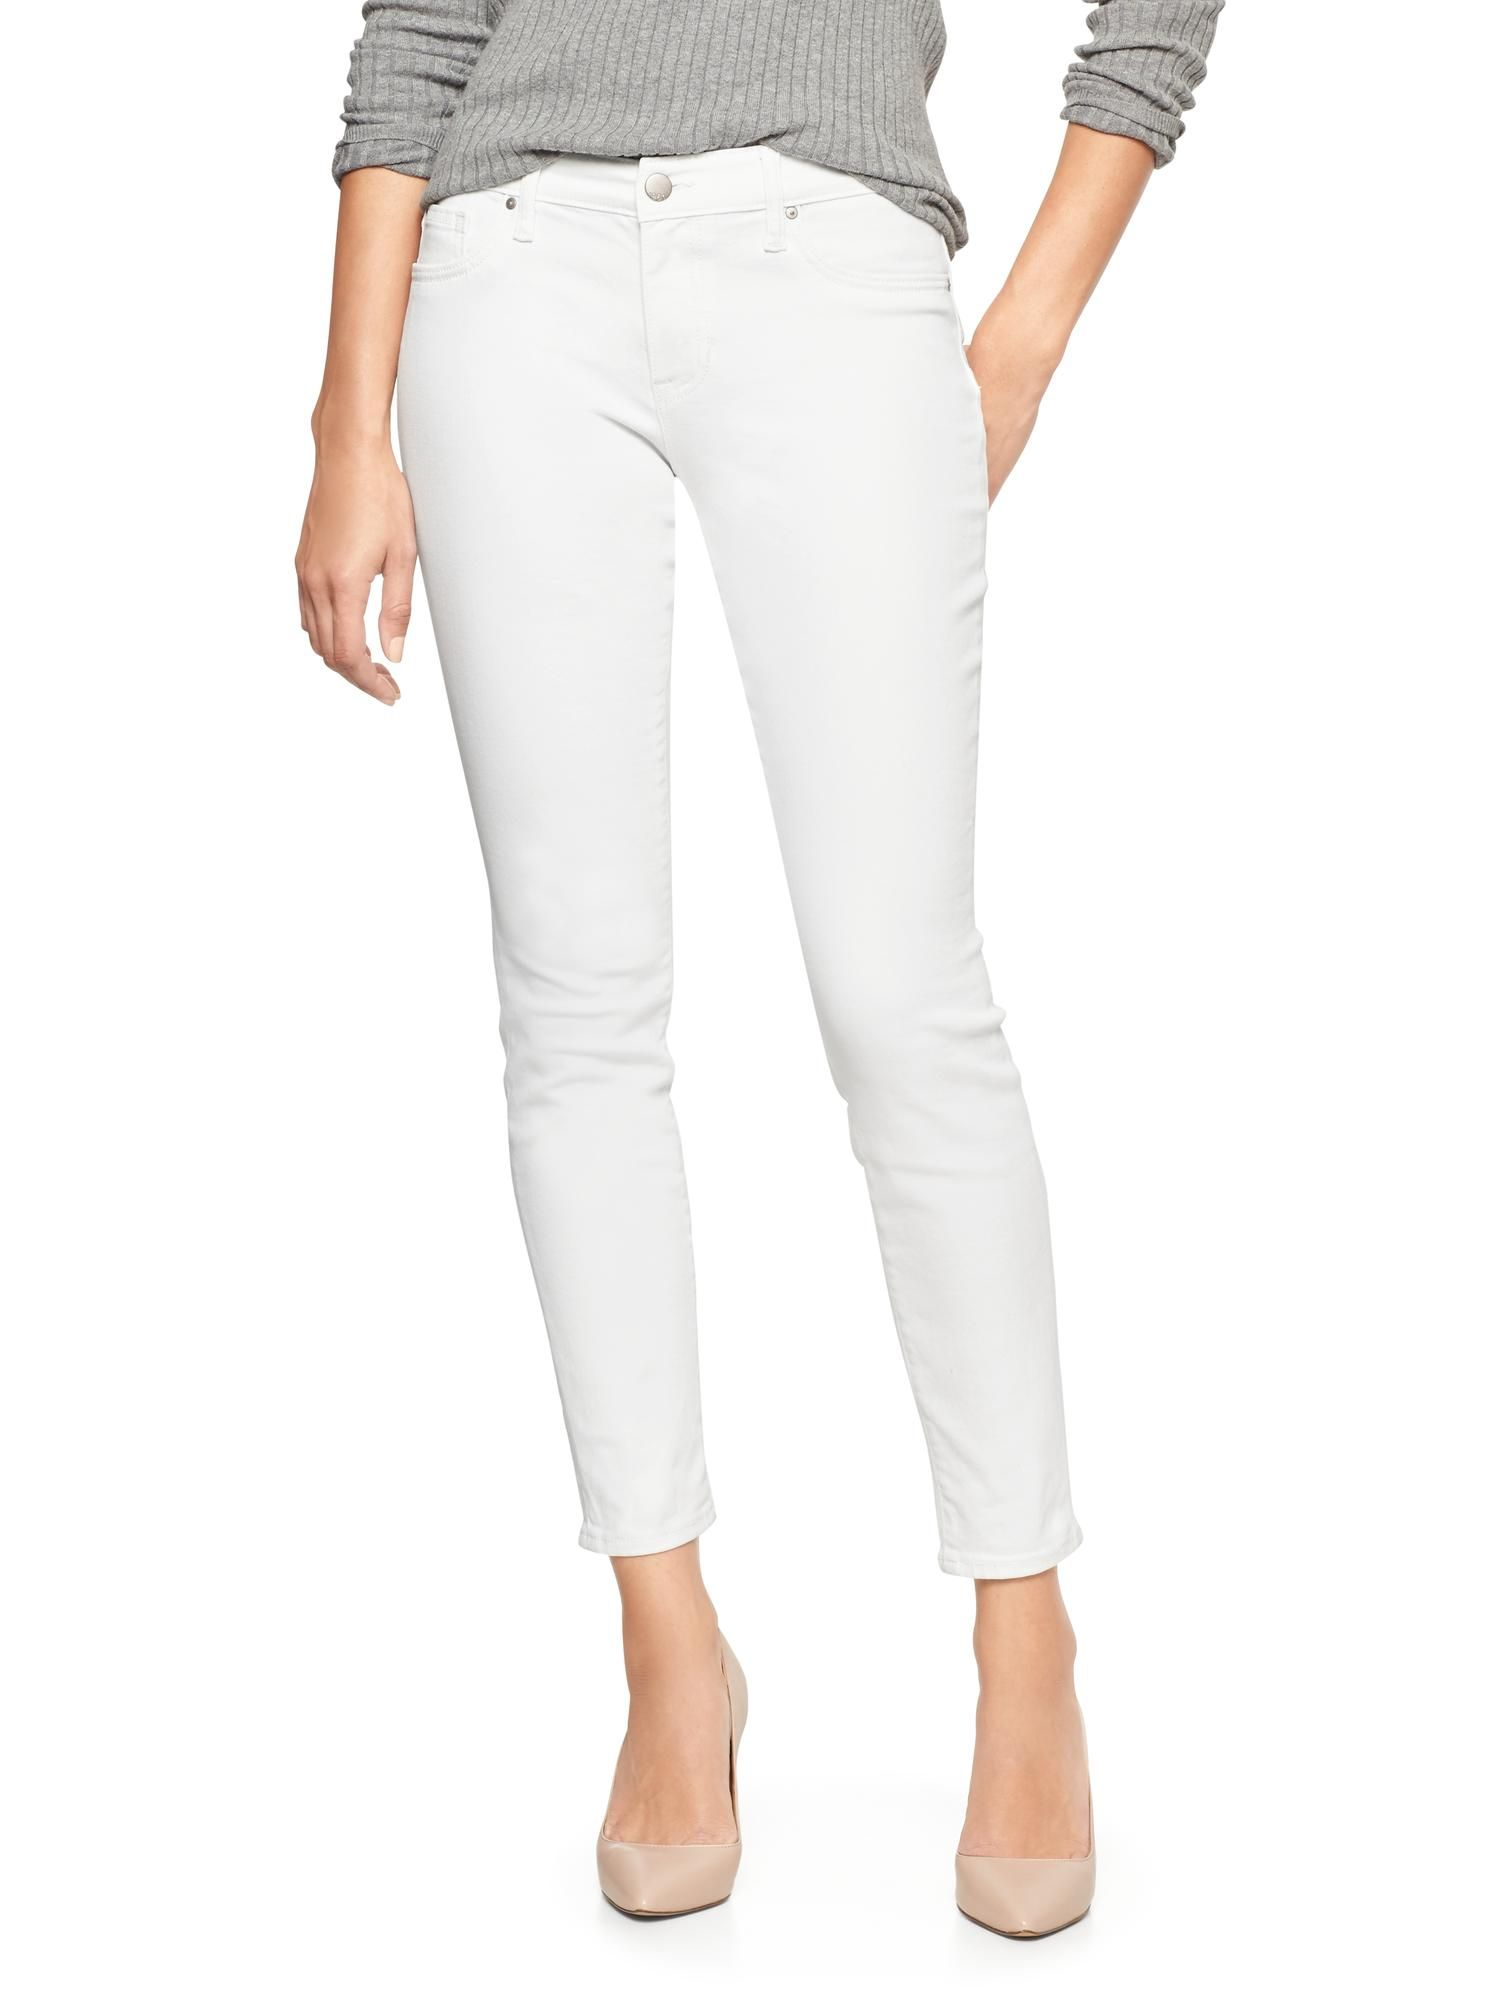 598237dd55726 Gap Legging Skimmer Jeans- WORLDS BEST JEANS | warm weather wear ...